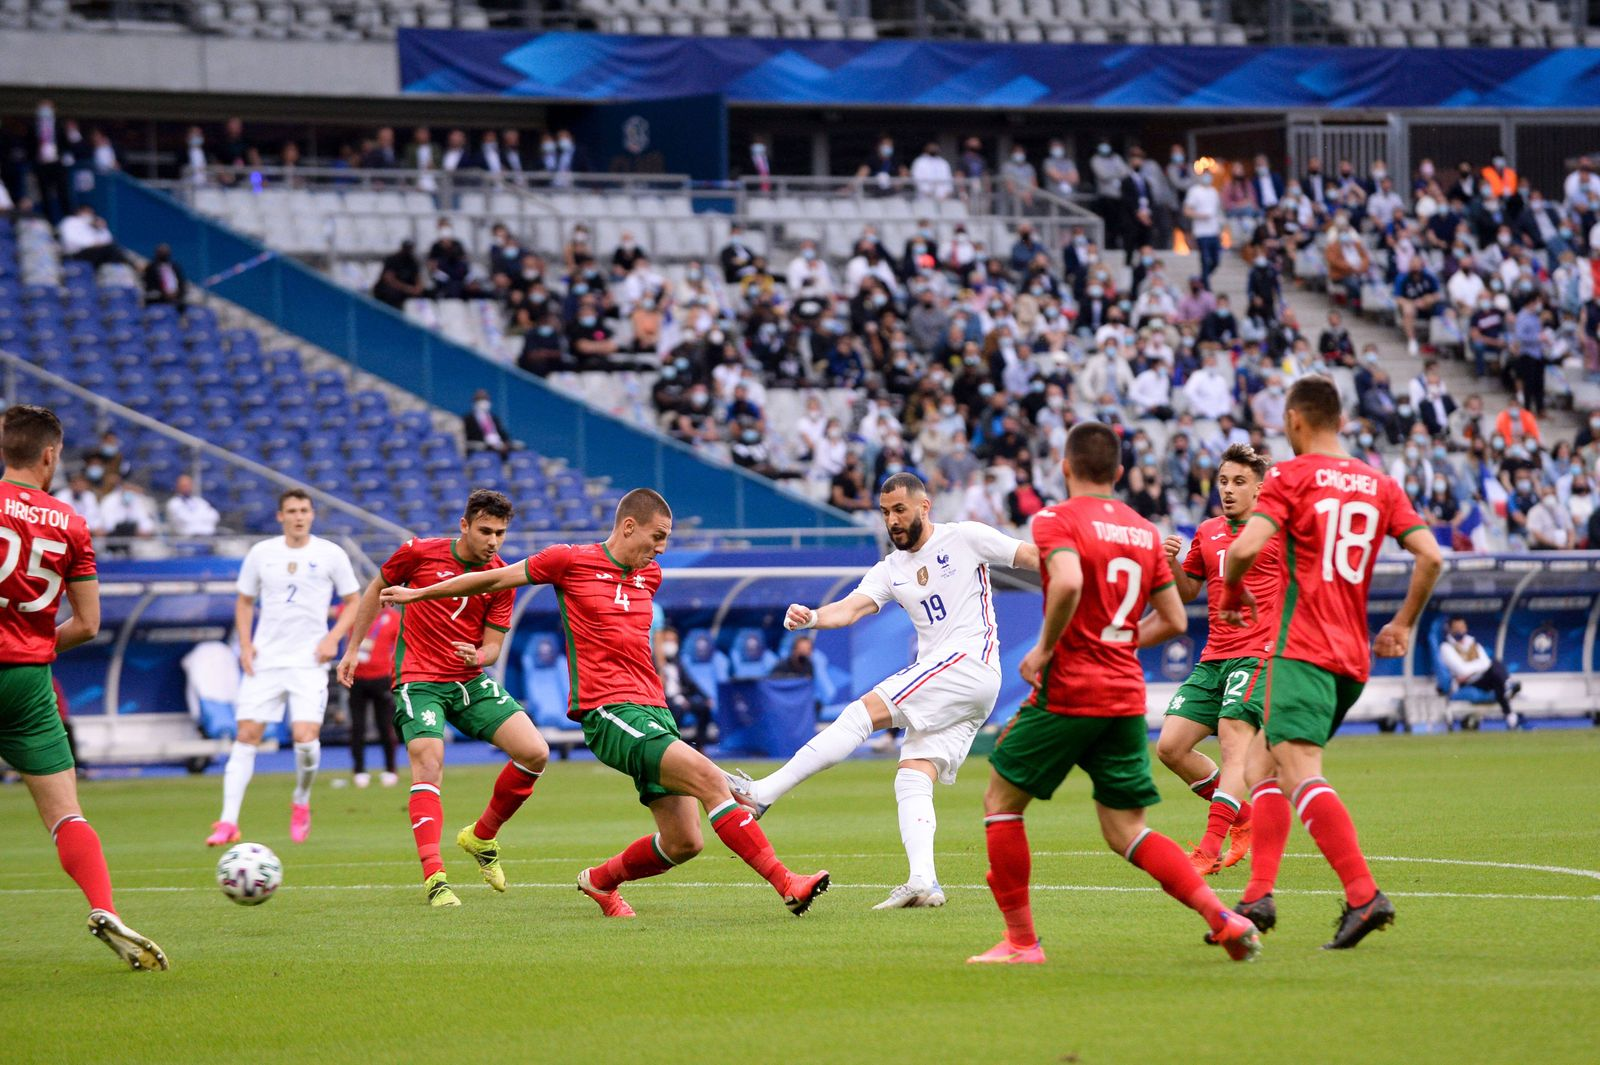 19 KARIM BENZEMA (FRA) - 04 VALENTIN ANTOV (BUL) FOOTBALL : France vs Bulgarie - Match Amical - Preparation UEFA EURO, E